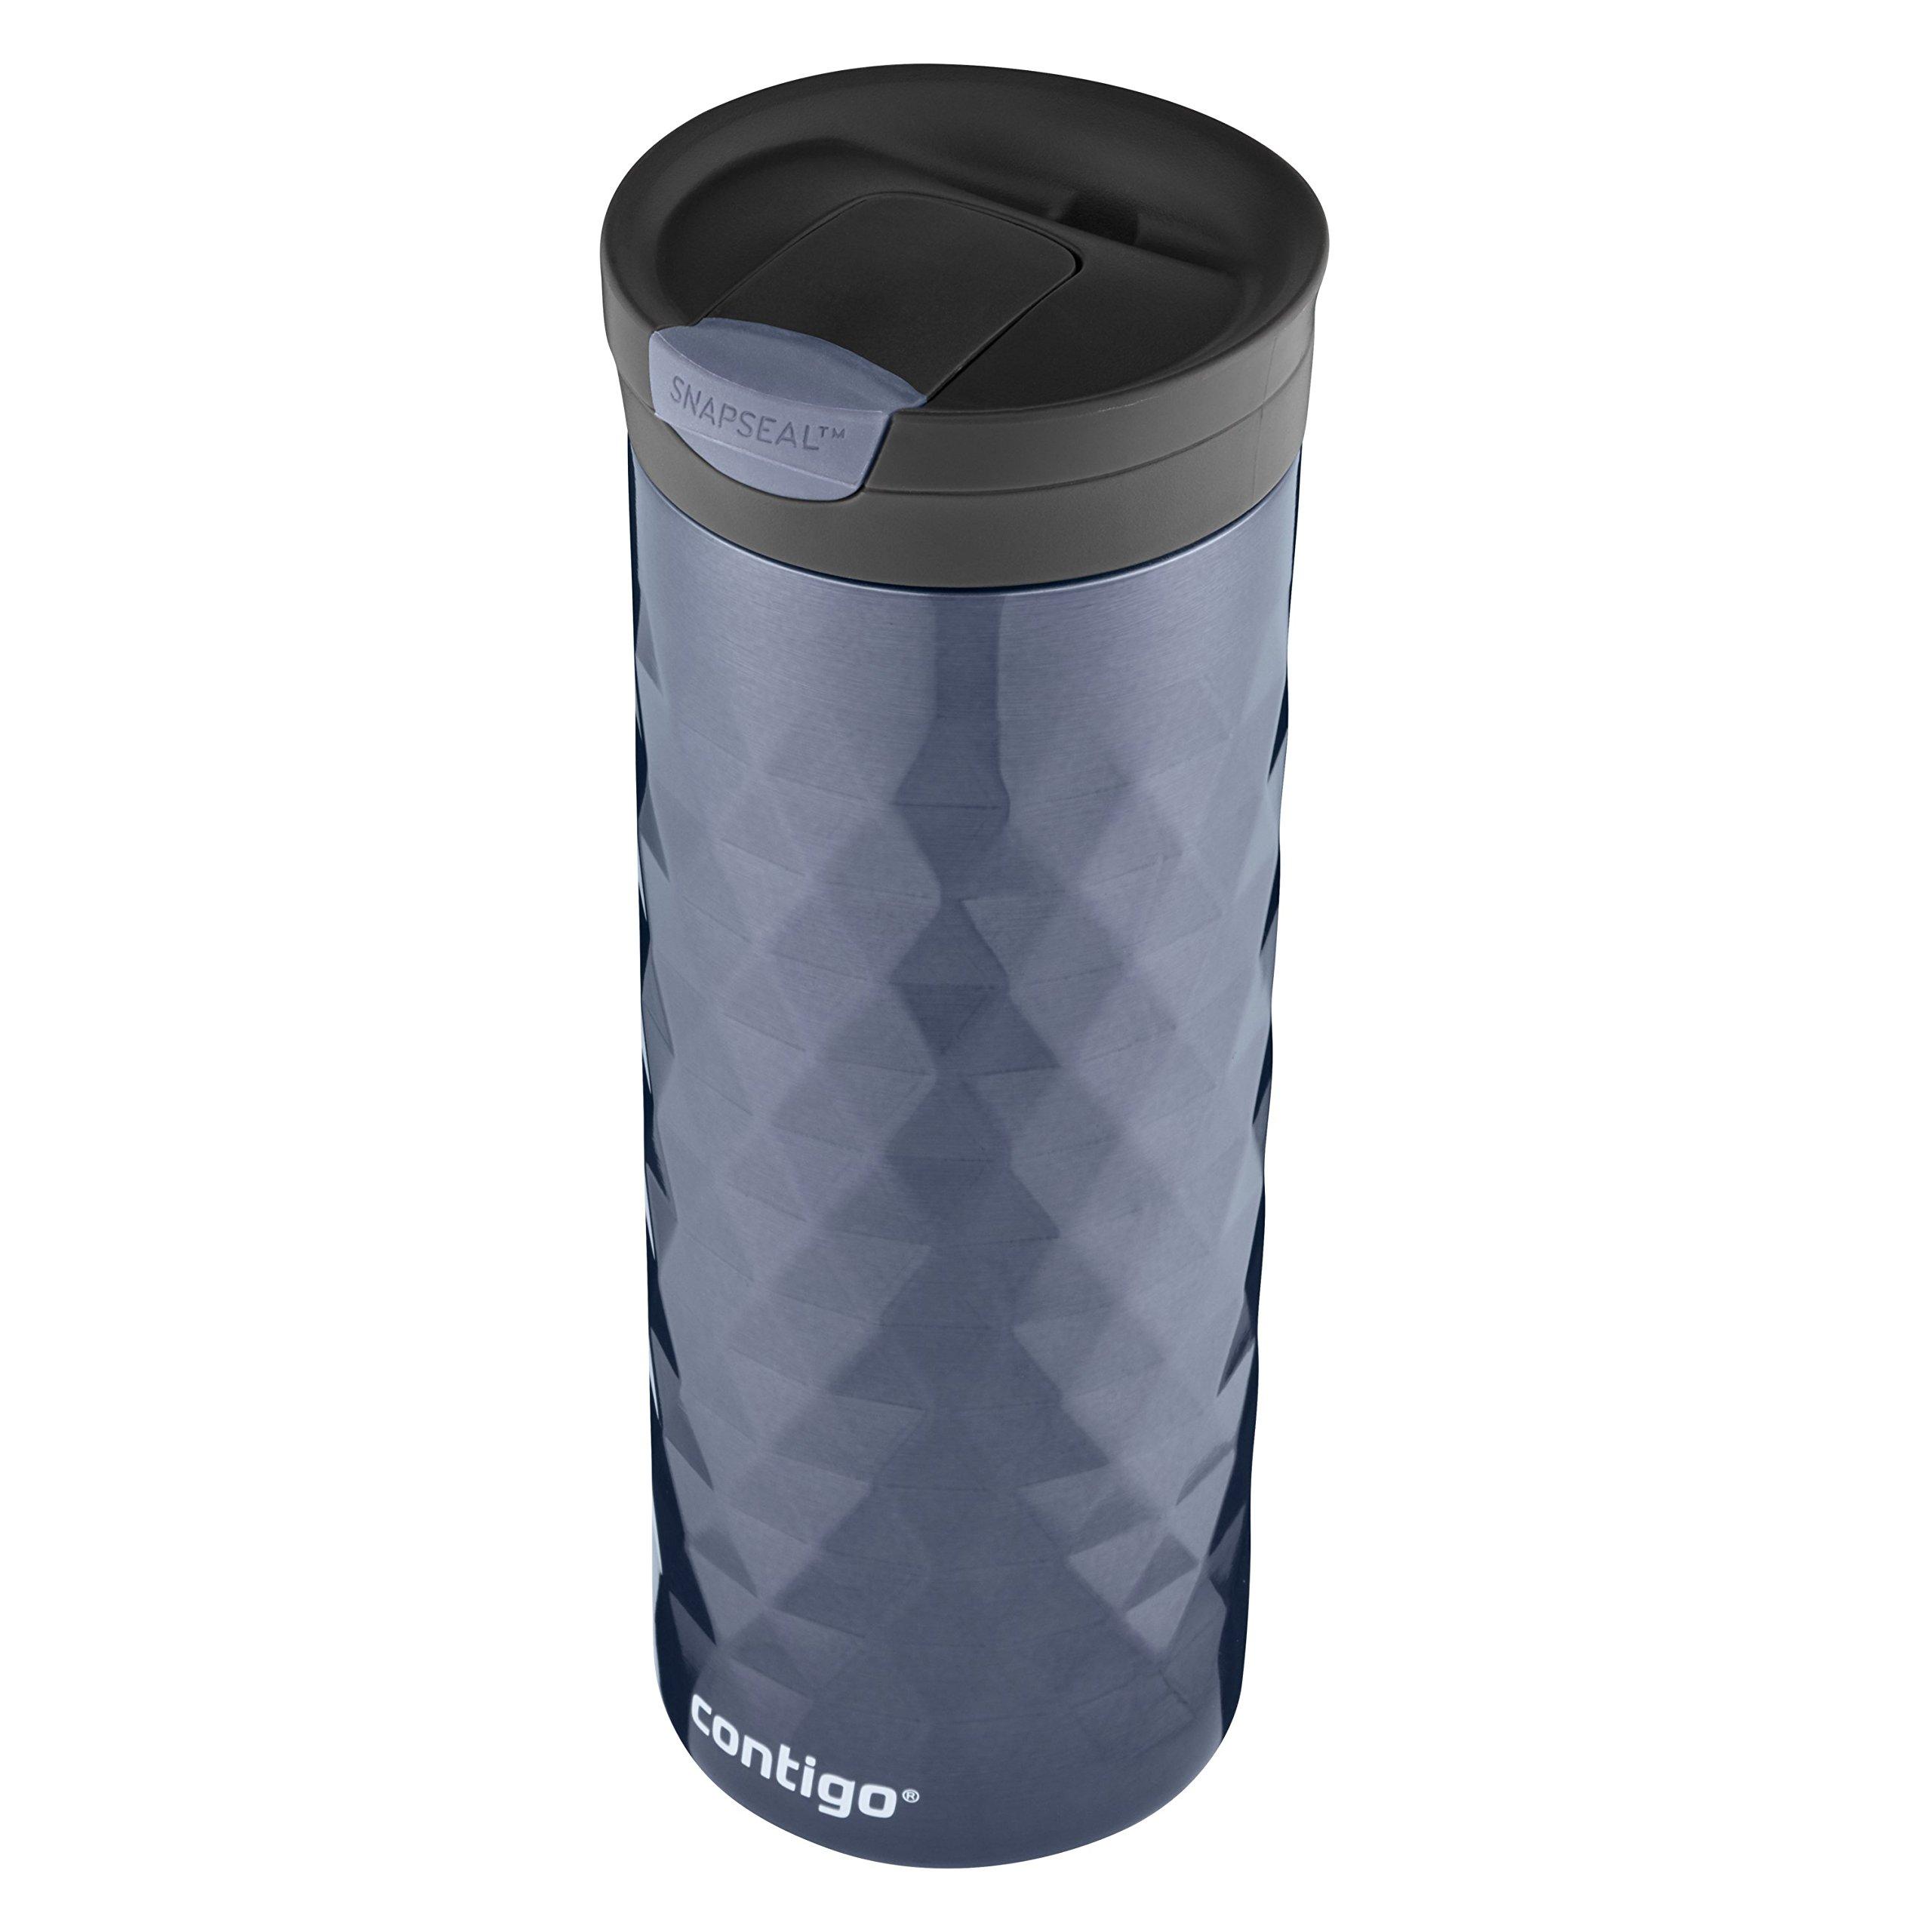 Contigo SnapSeal Kenton Stainless Steel Travel Mug, 20 oz, Serenity by Contigo (Image #3)